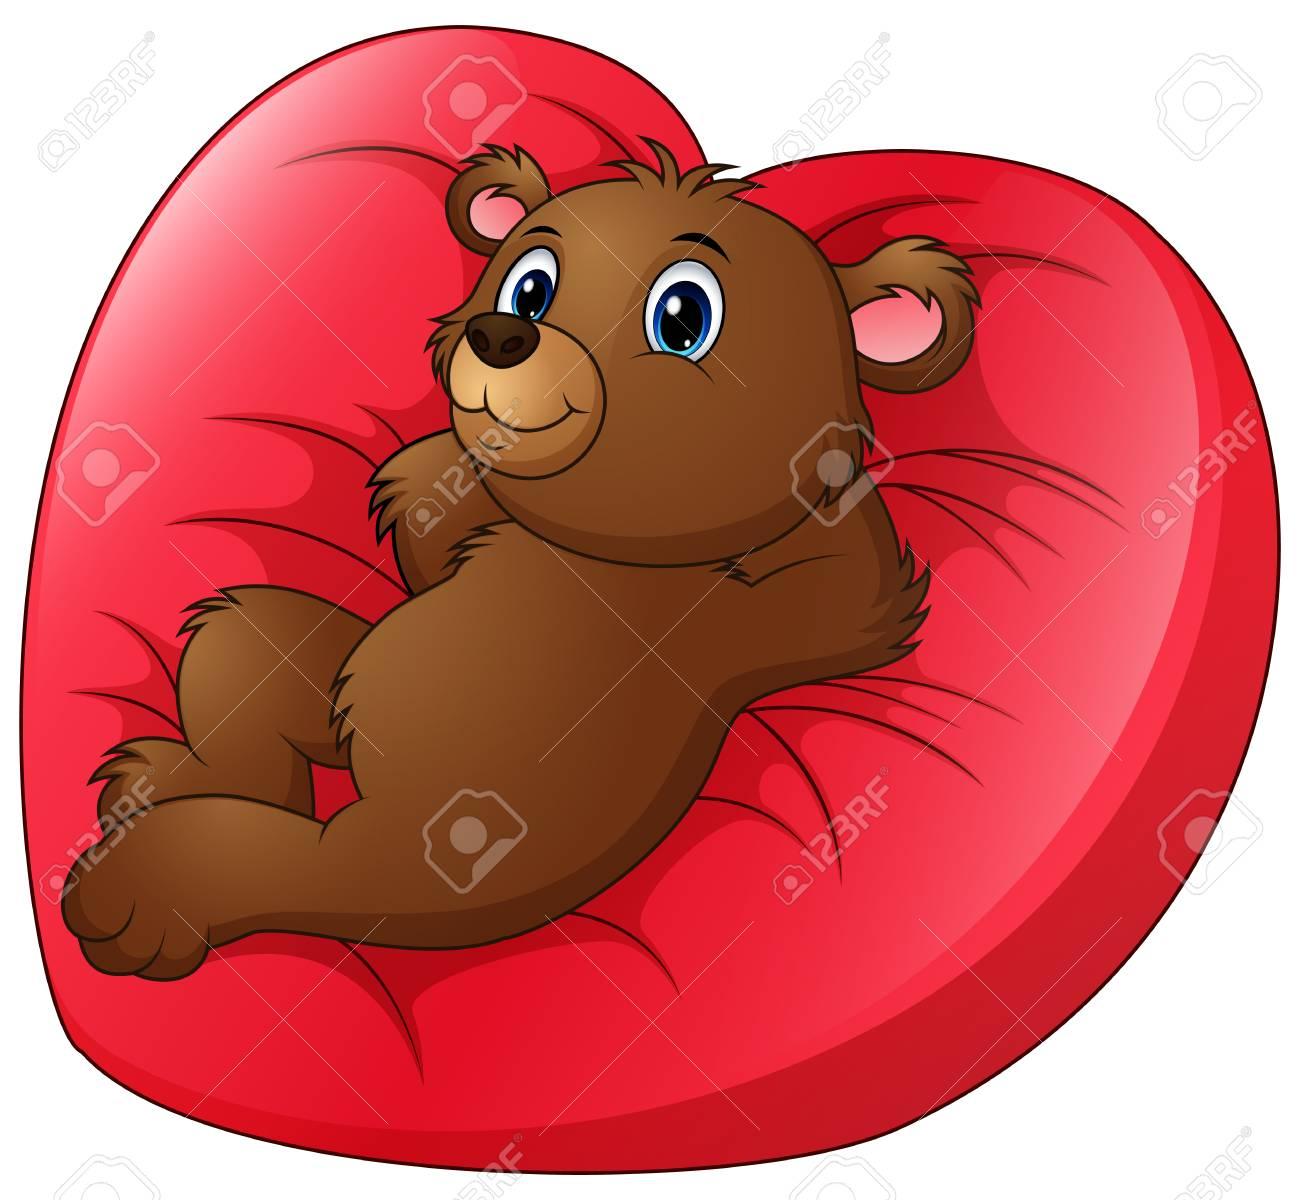 Cartoon Bear Relax On Heart Shaped Bed Stock Vector   70935425